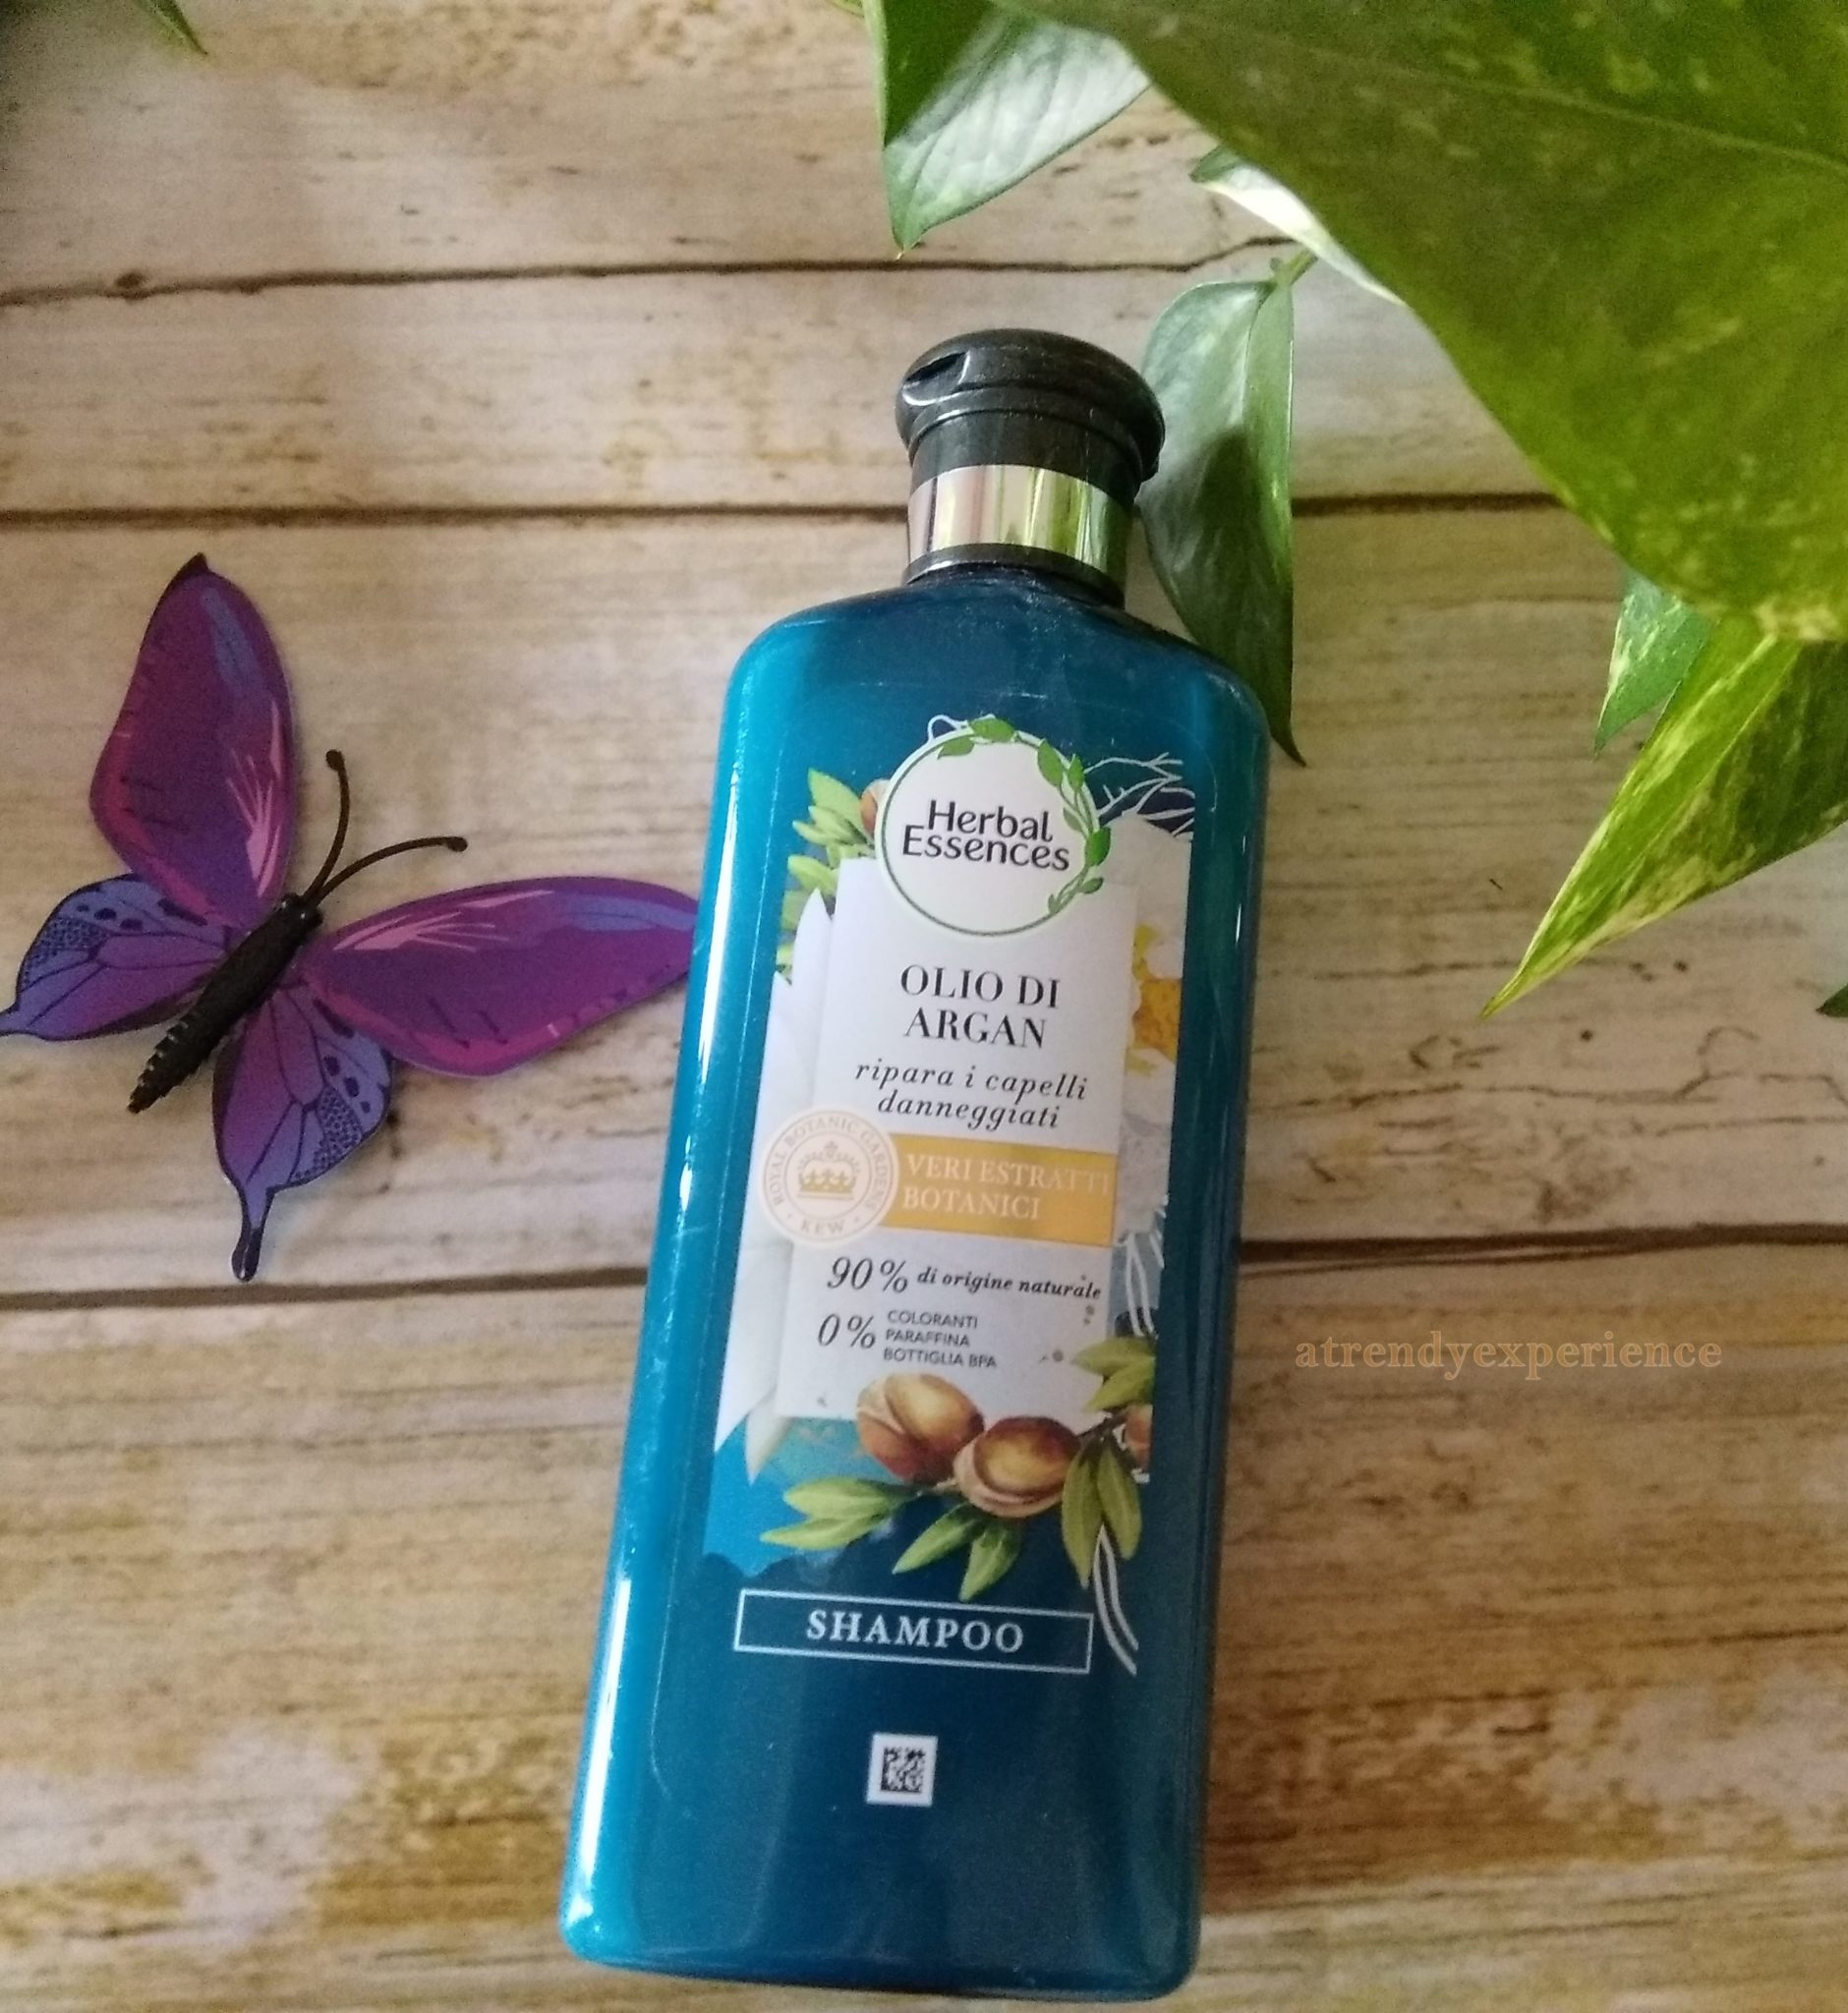 shampoo herbal essences olio di argan